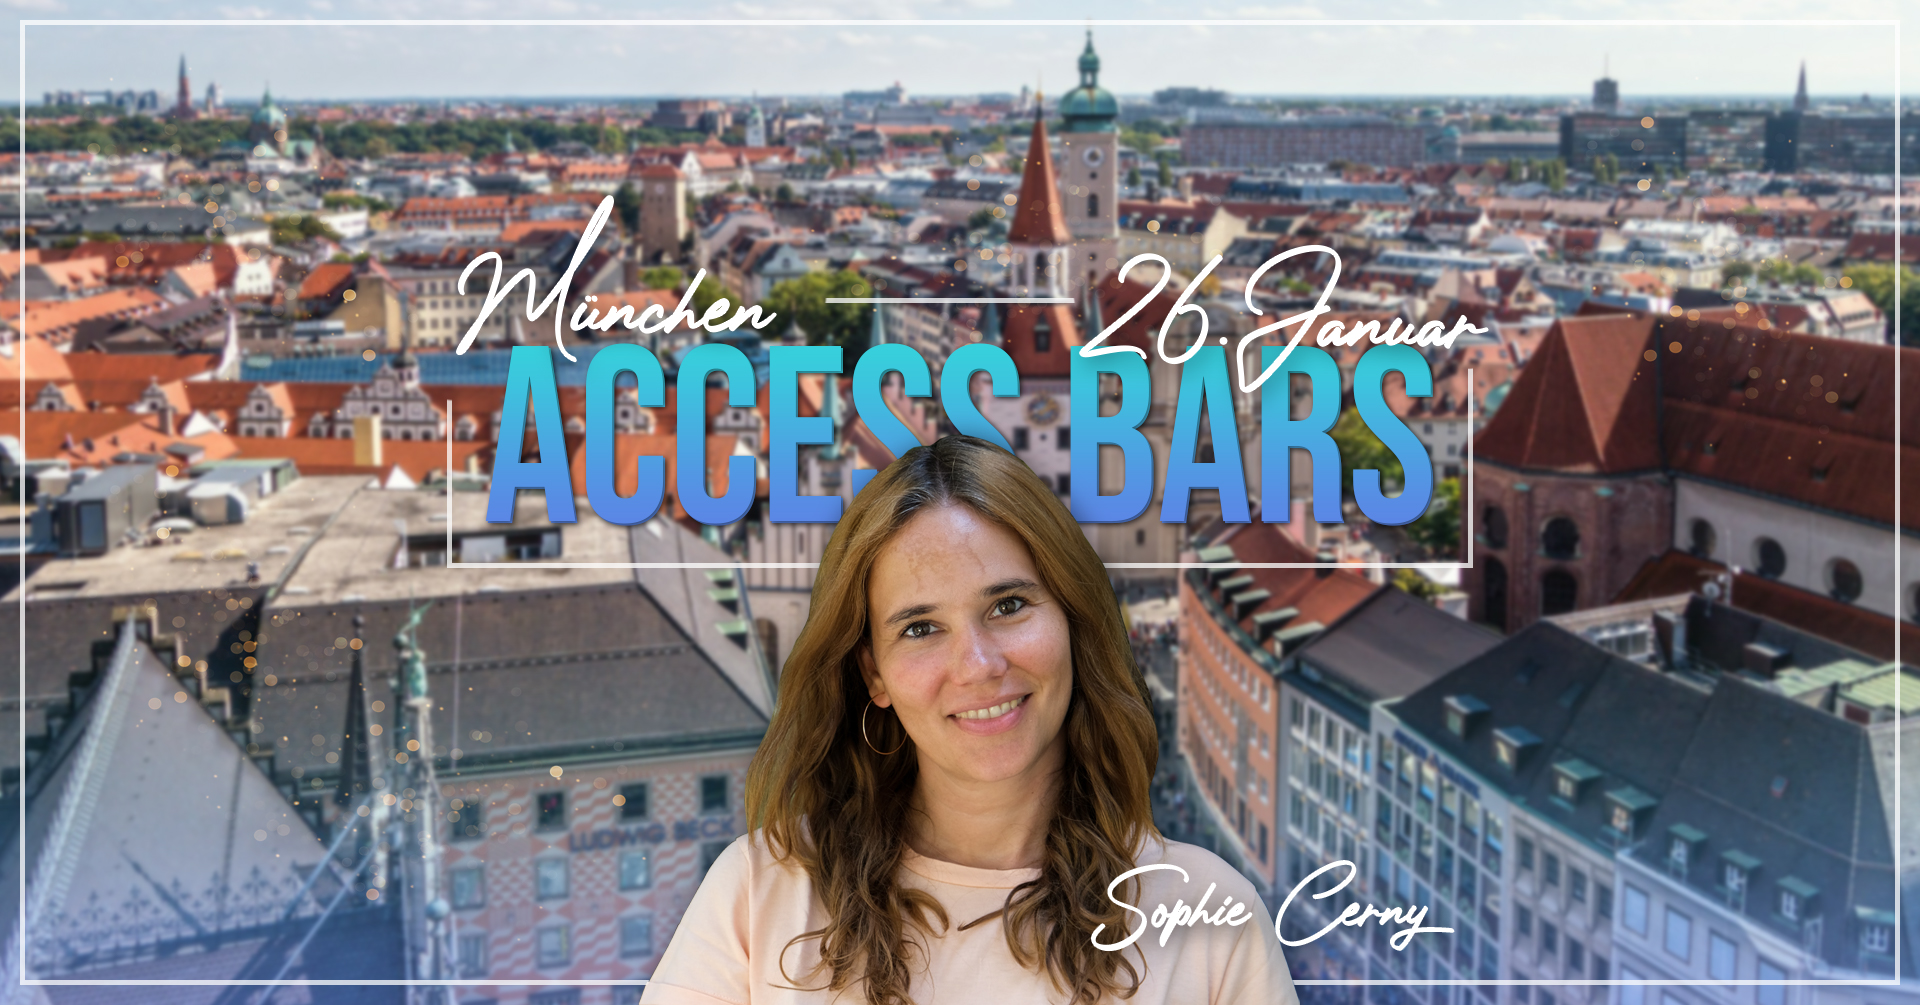 München Access Bars Sophie Cerny